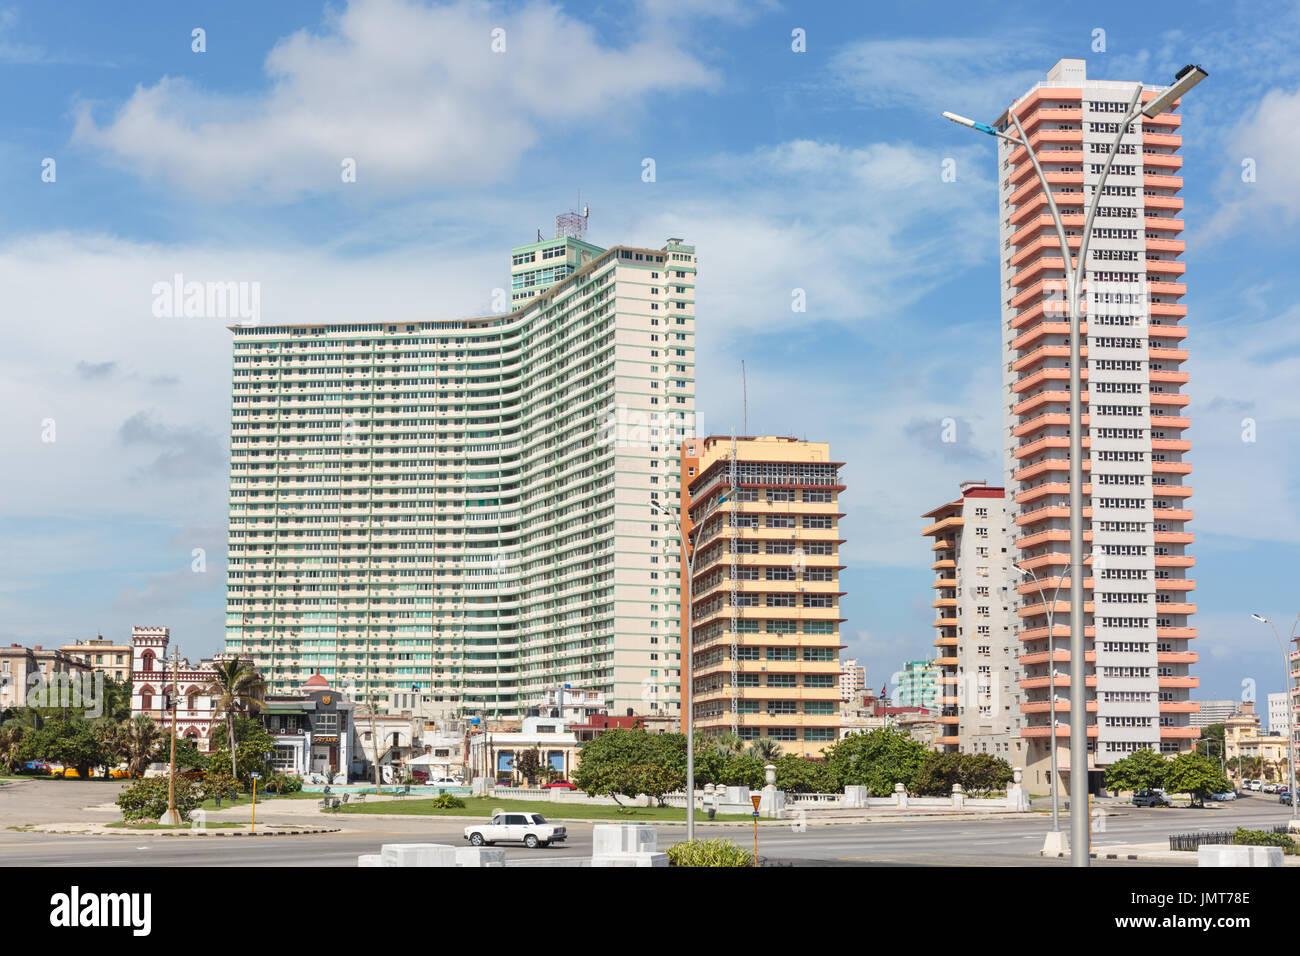 Pastel Coloured Retro Look High Rise Apartment Block Buildings Near The Malecon Vedado Havana Cuba